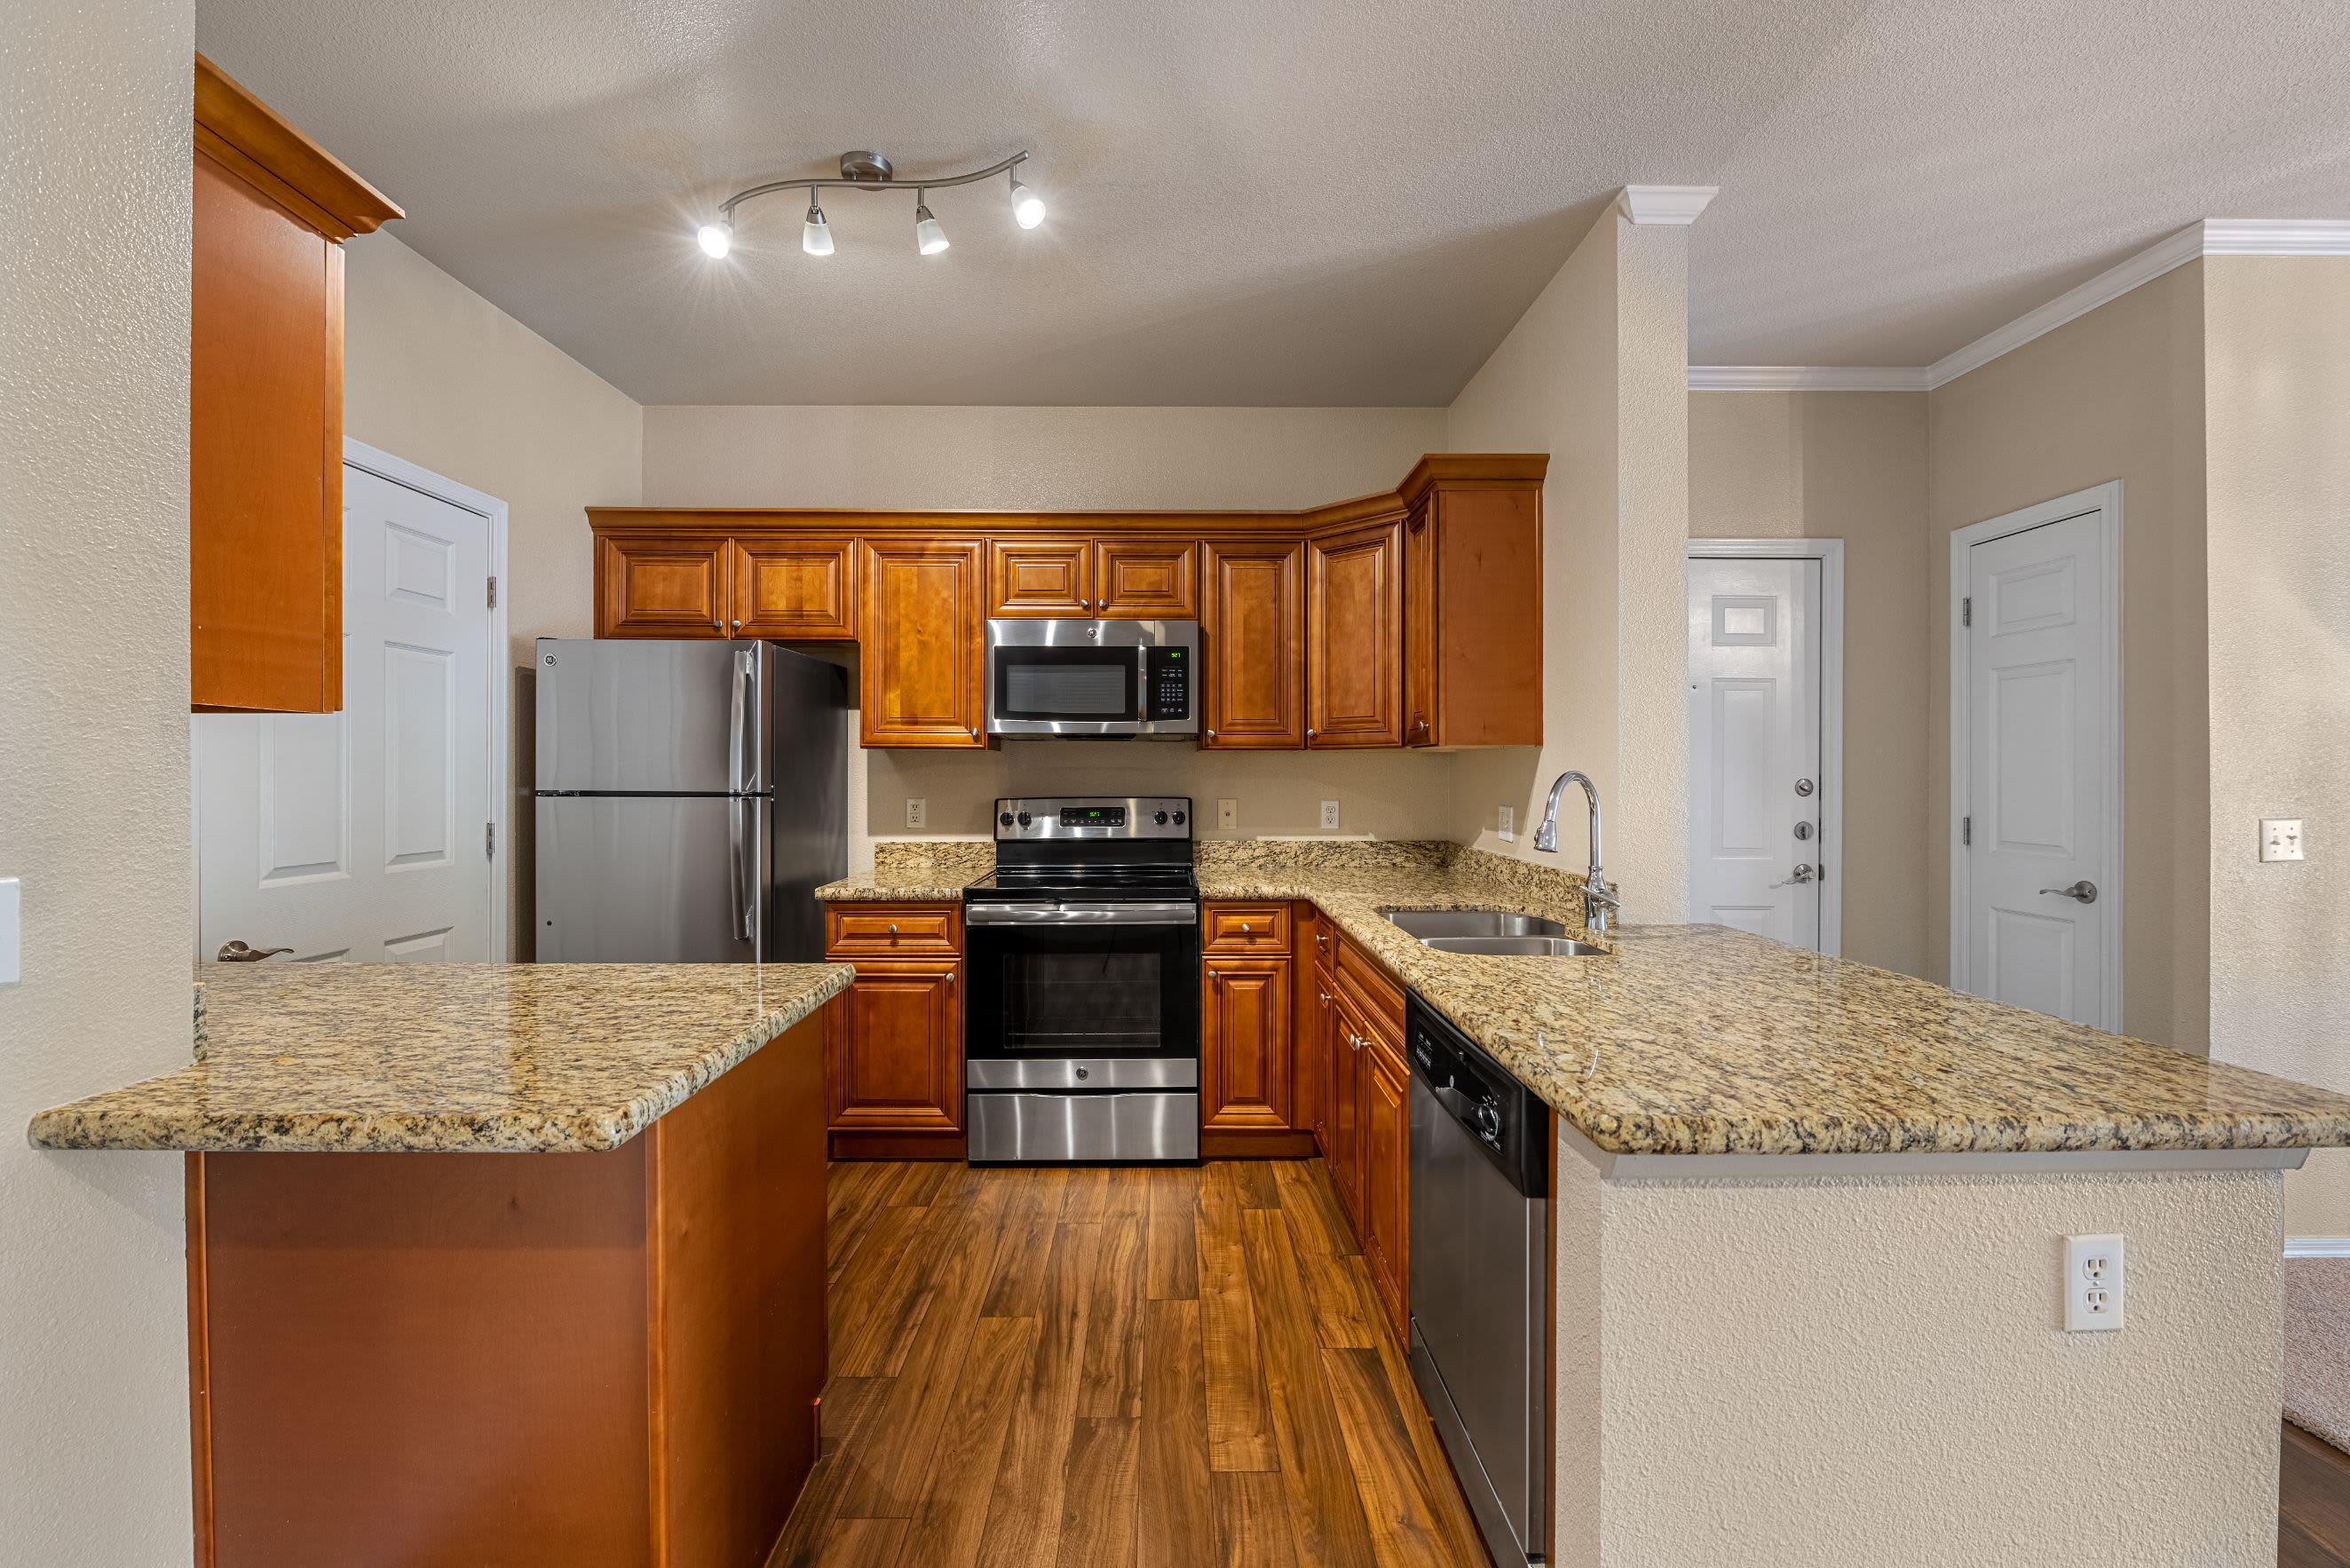 Spacious kitchen with wood style floors Azure Creek in Cave Creek, Arizona